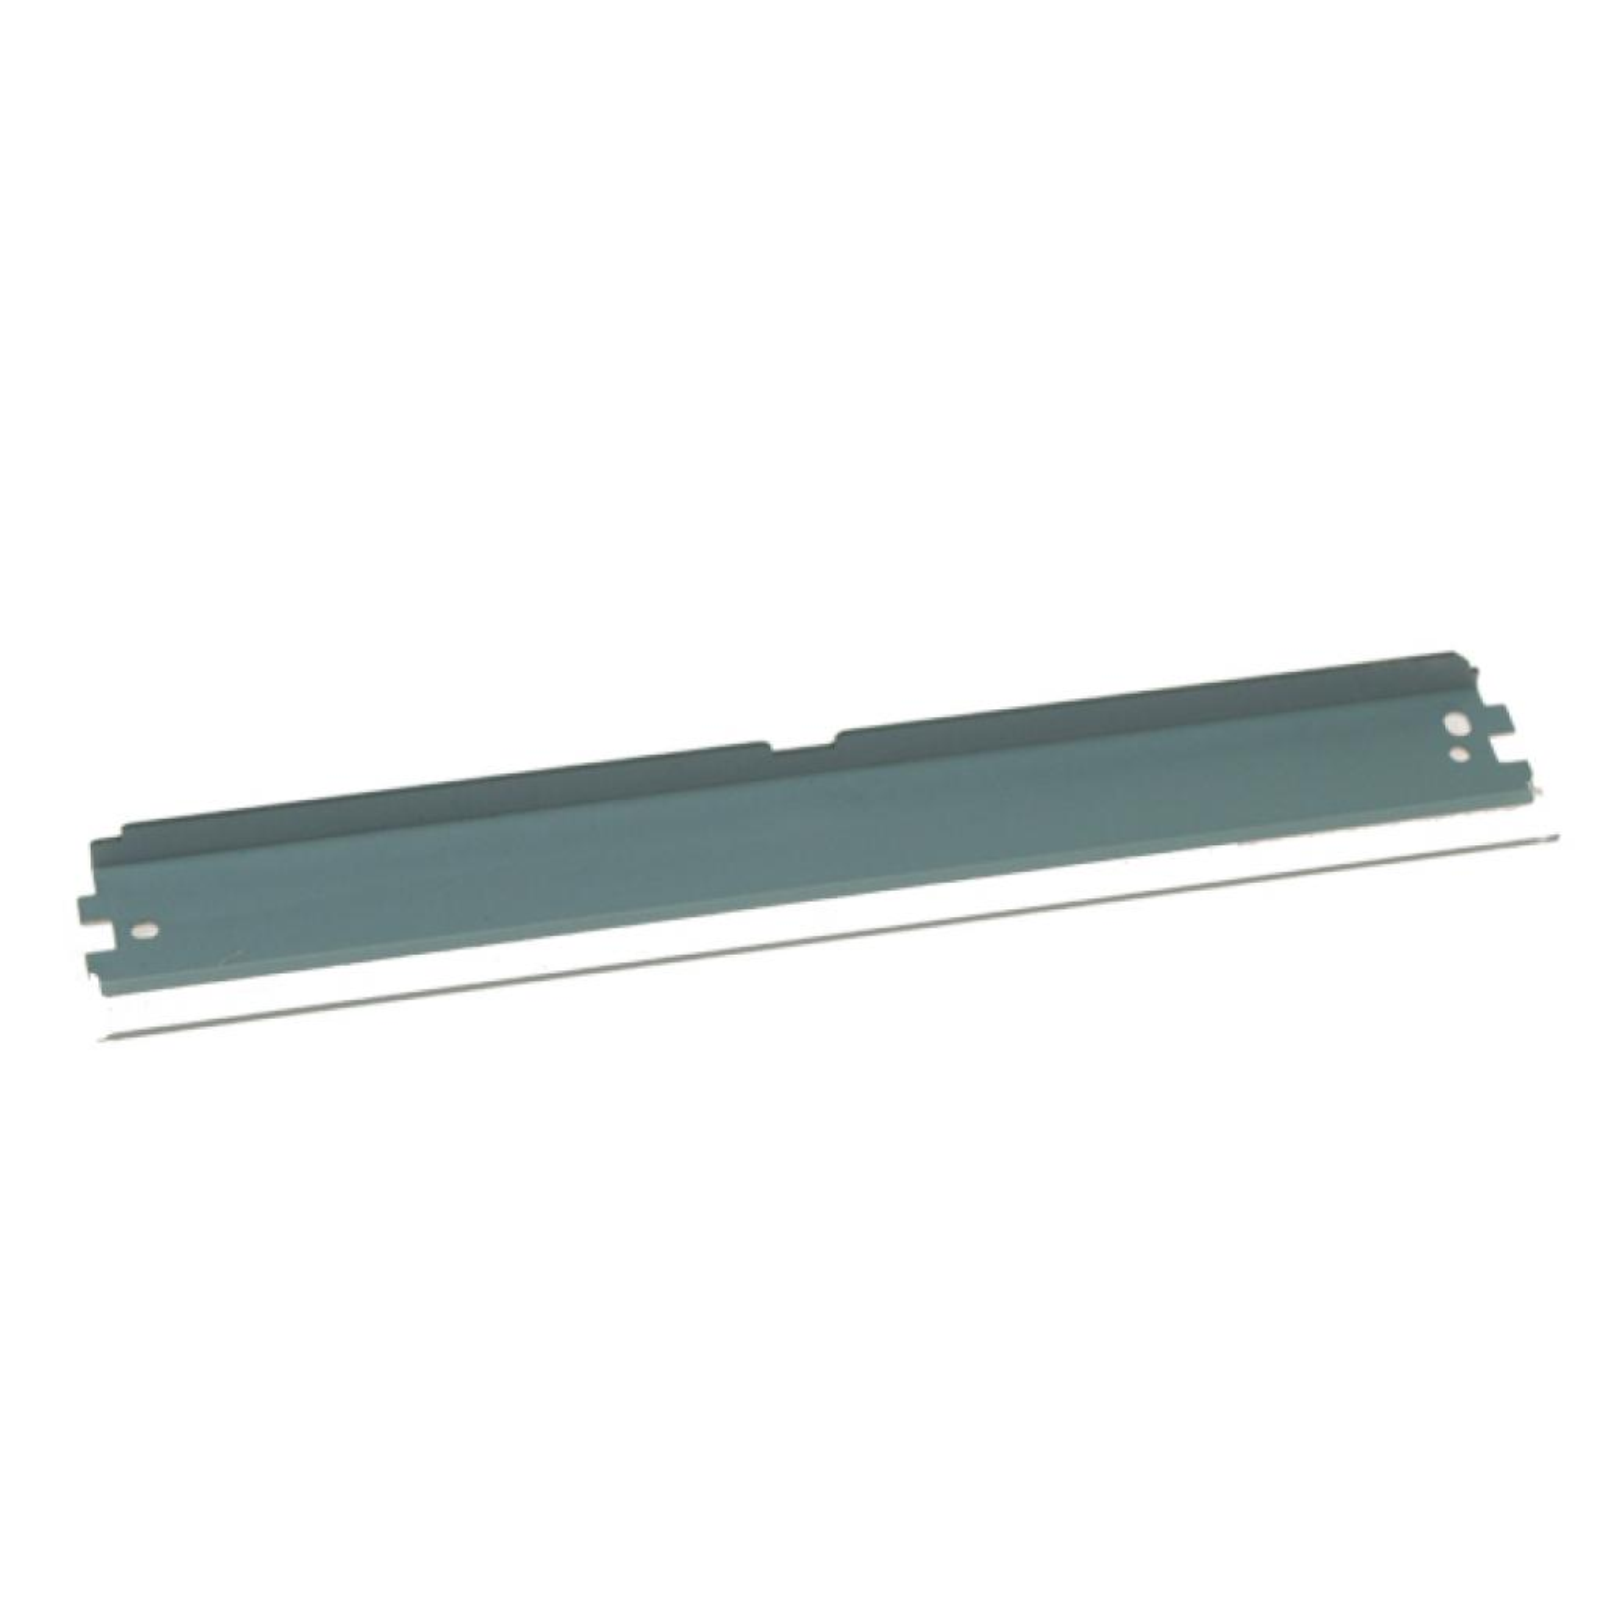 Чистящее лезвие Kuroki (Ракель) HP LJ P2035/P2055 (030052/DLC)